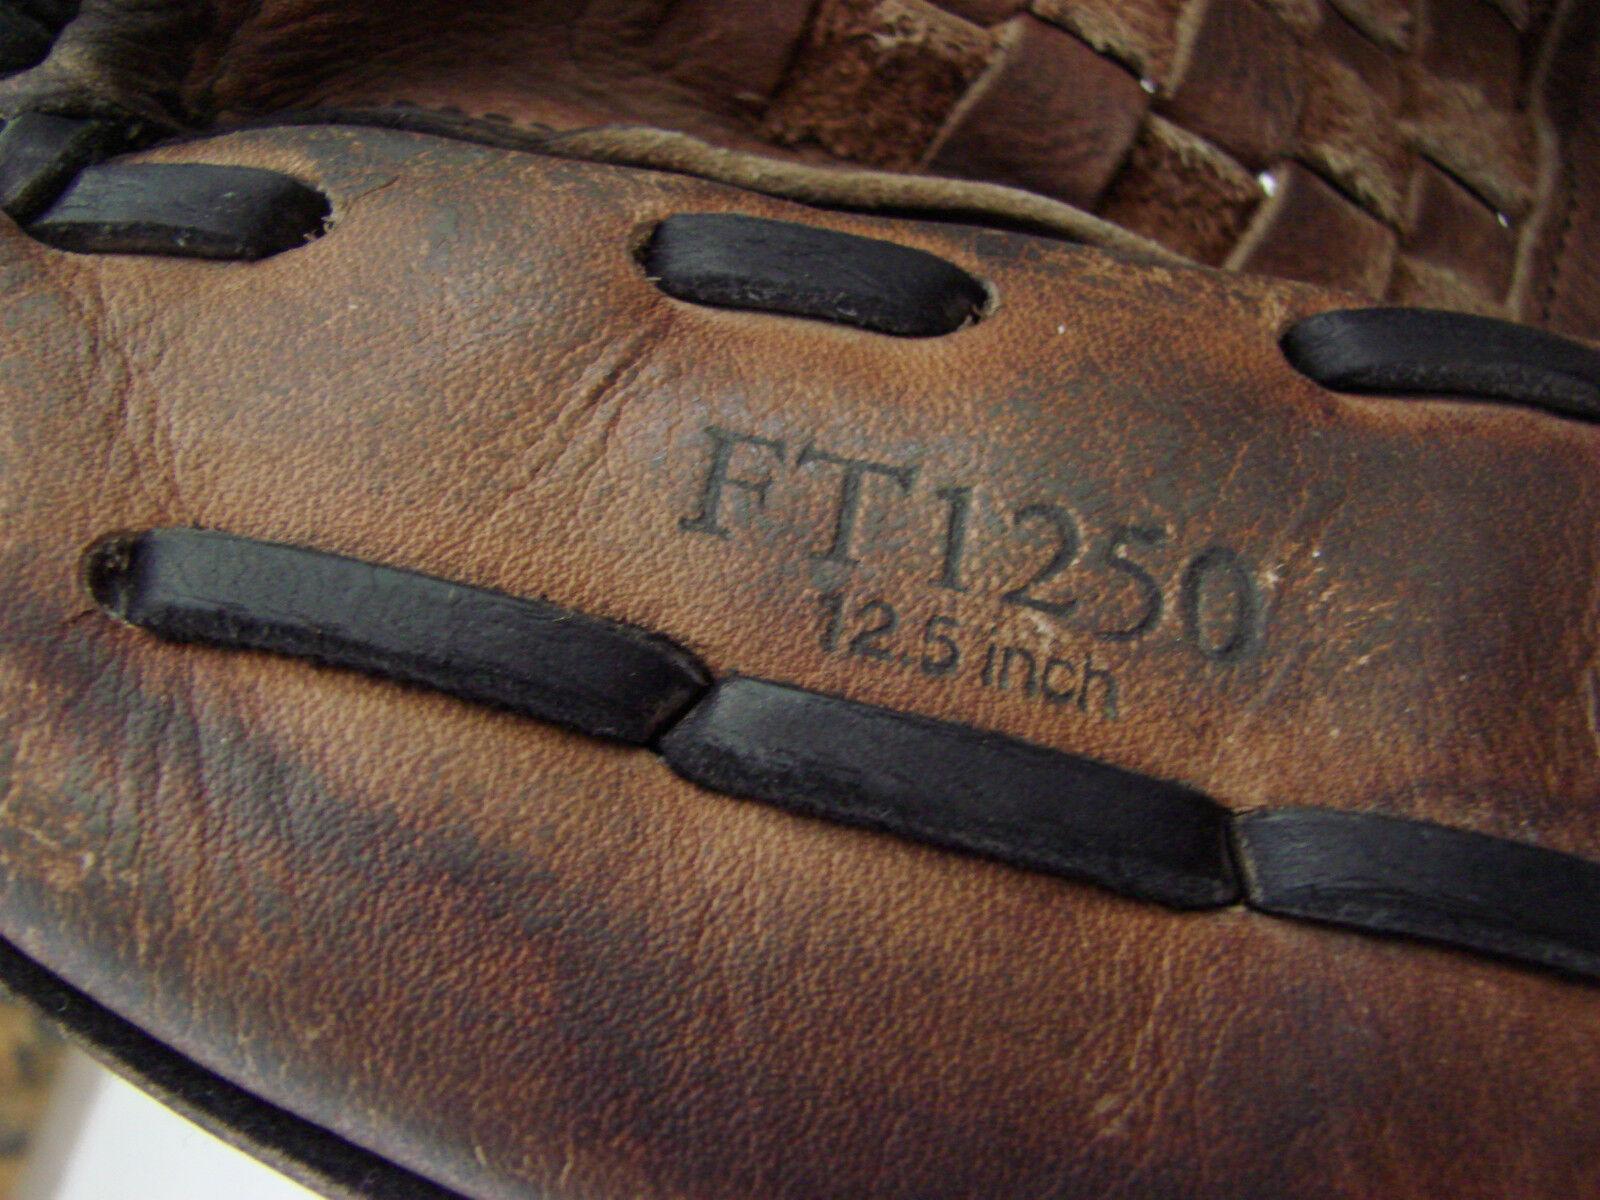 TPS RHT Professionall pattern FT1250 Baseball mitt Glove RHT TPS Lousiville 4a58bc